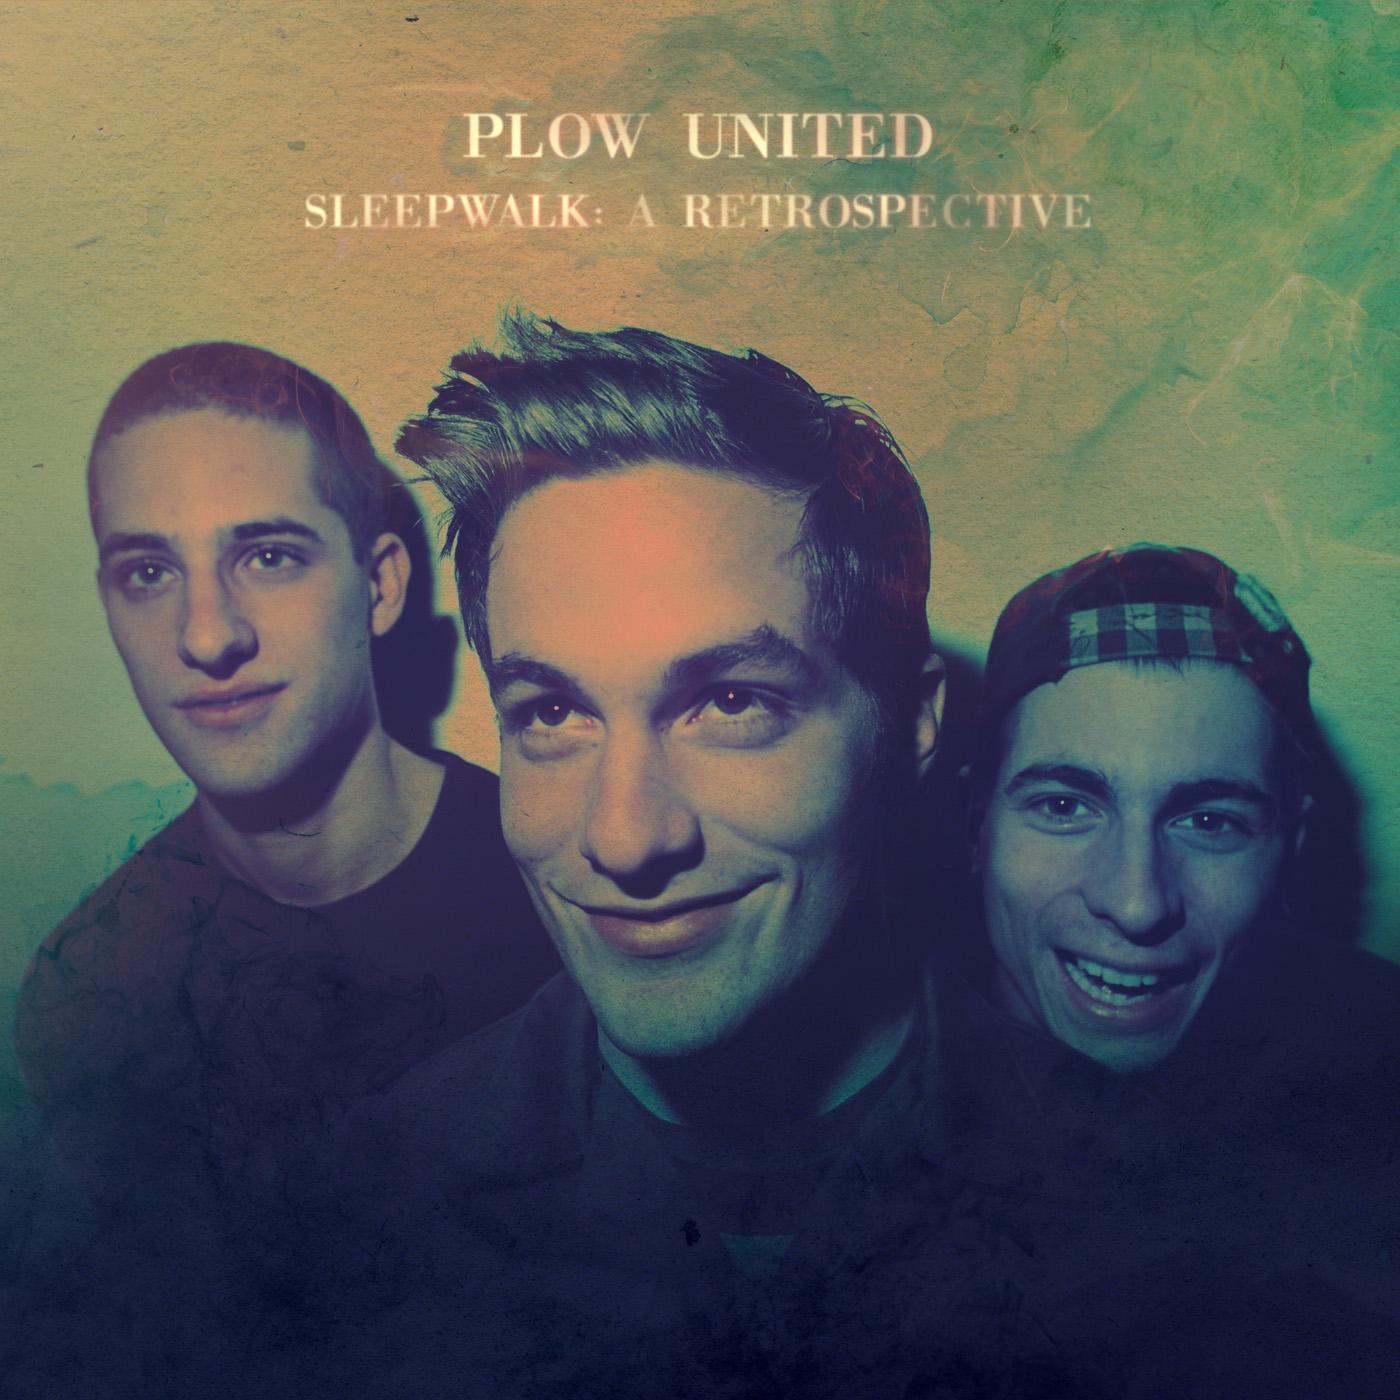 Plow United - Sleepwalk: A Retrospective CD